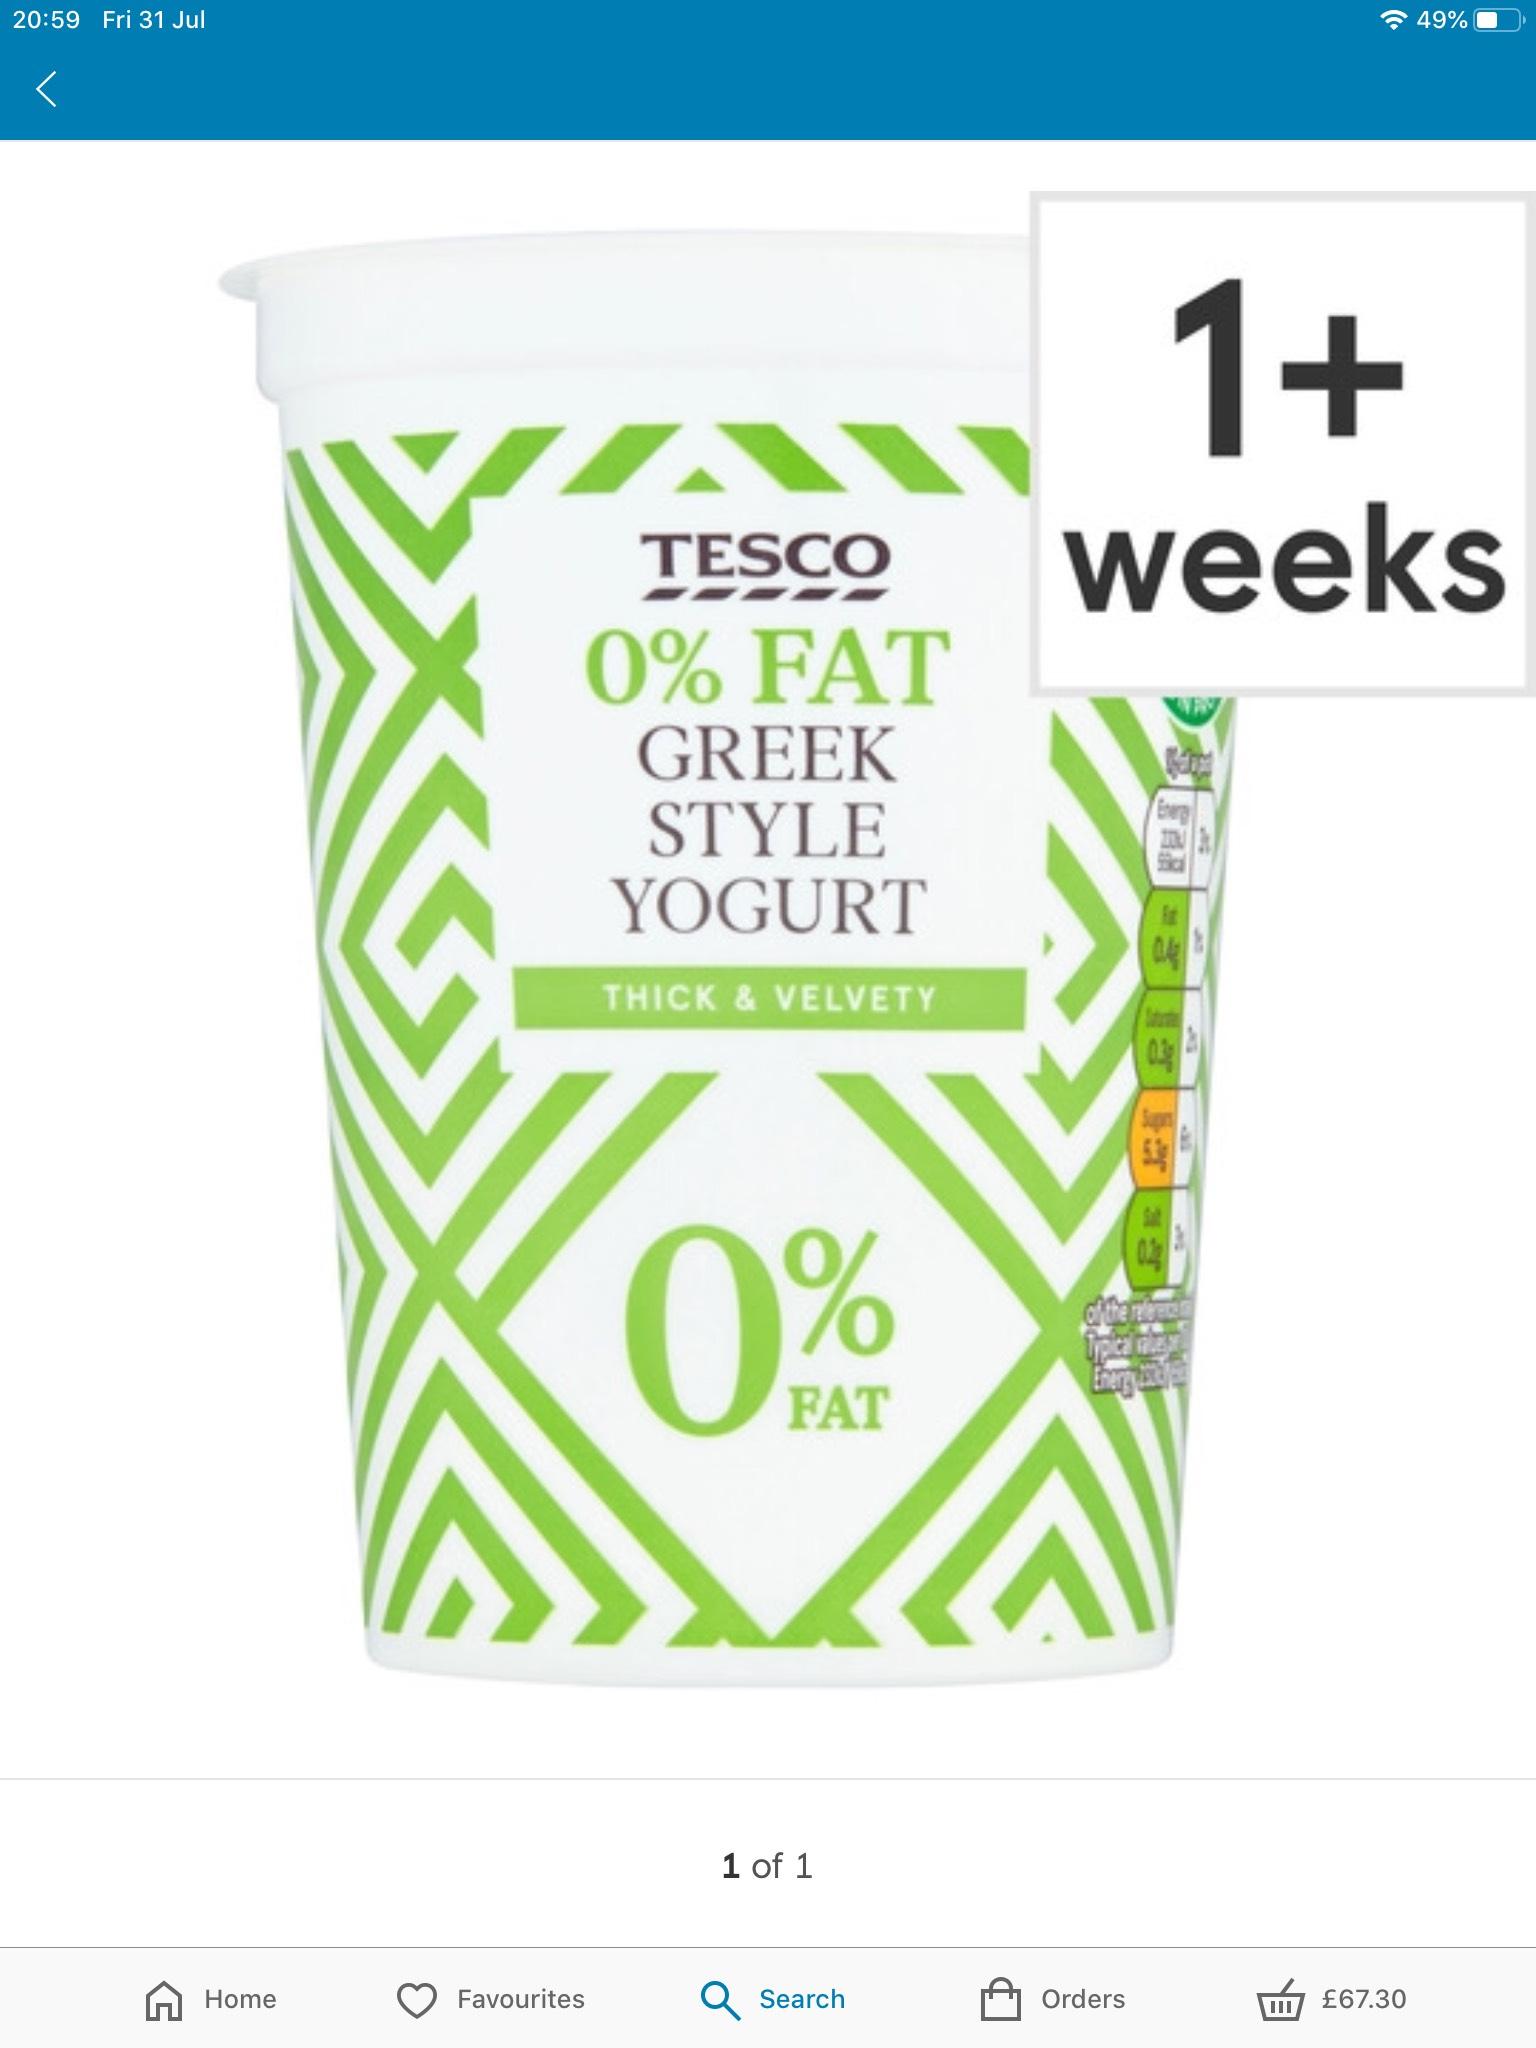 Tesco 0% Fat Greek Style Yogurt 500G 39p @ Tesco